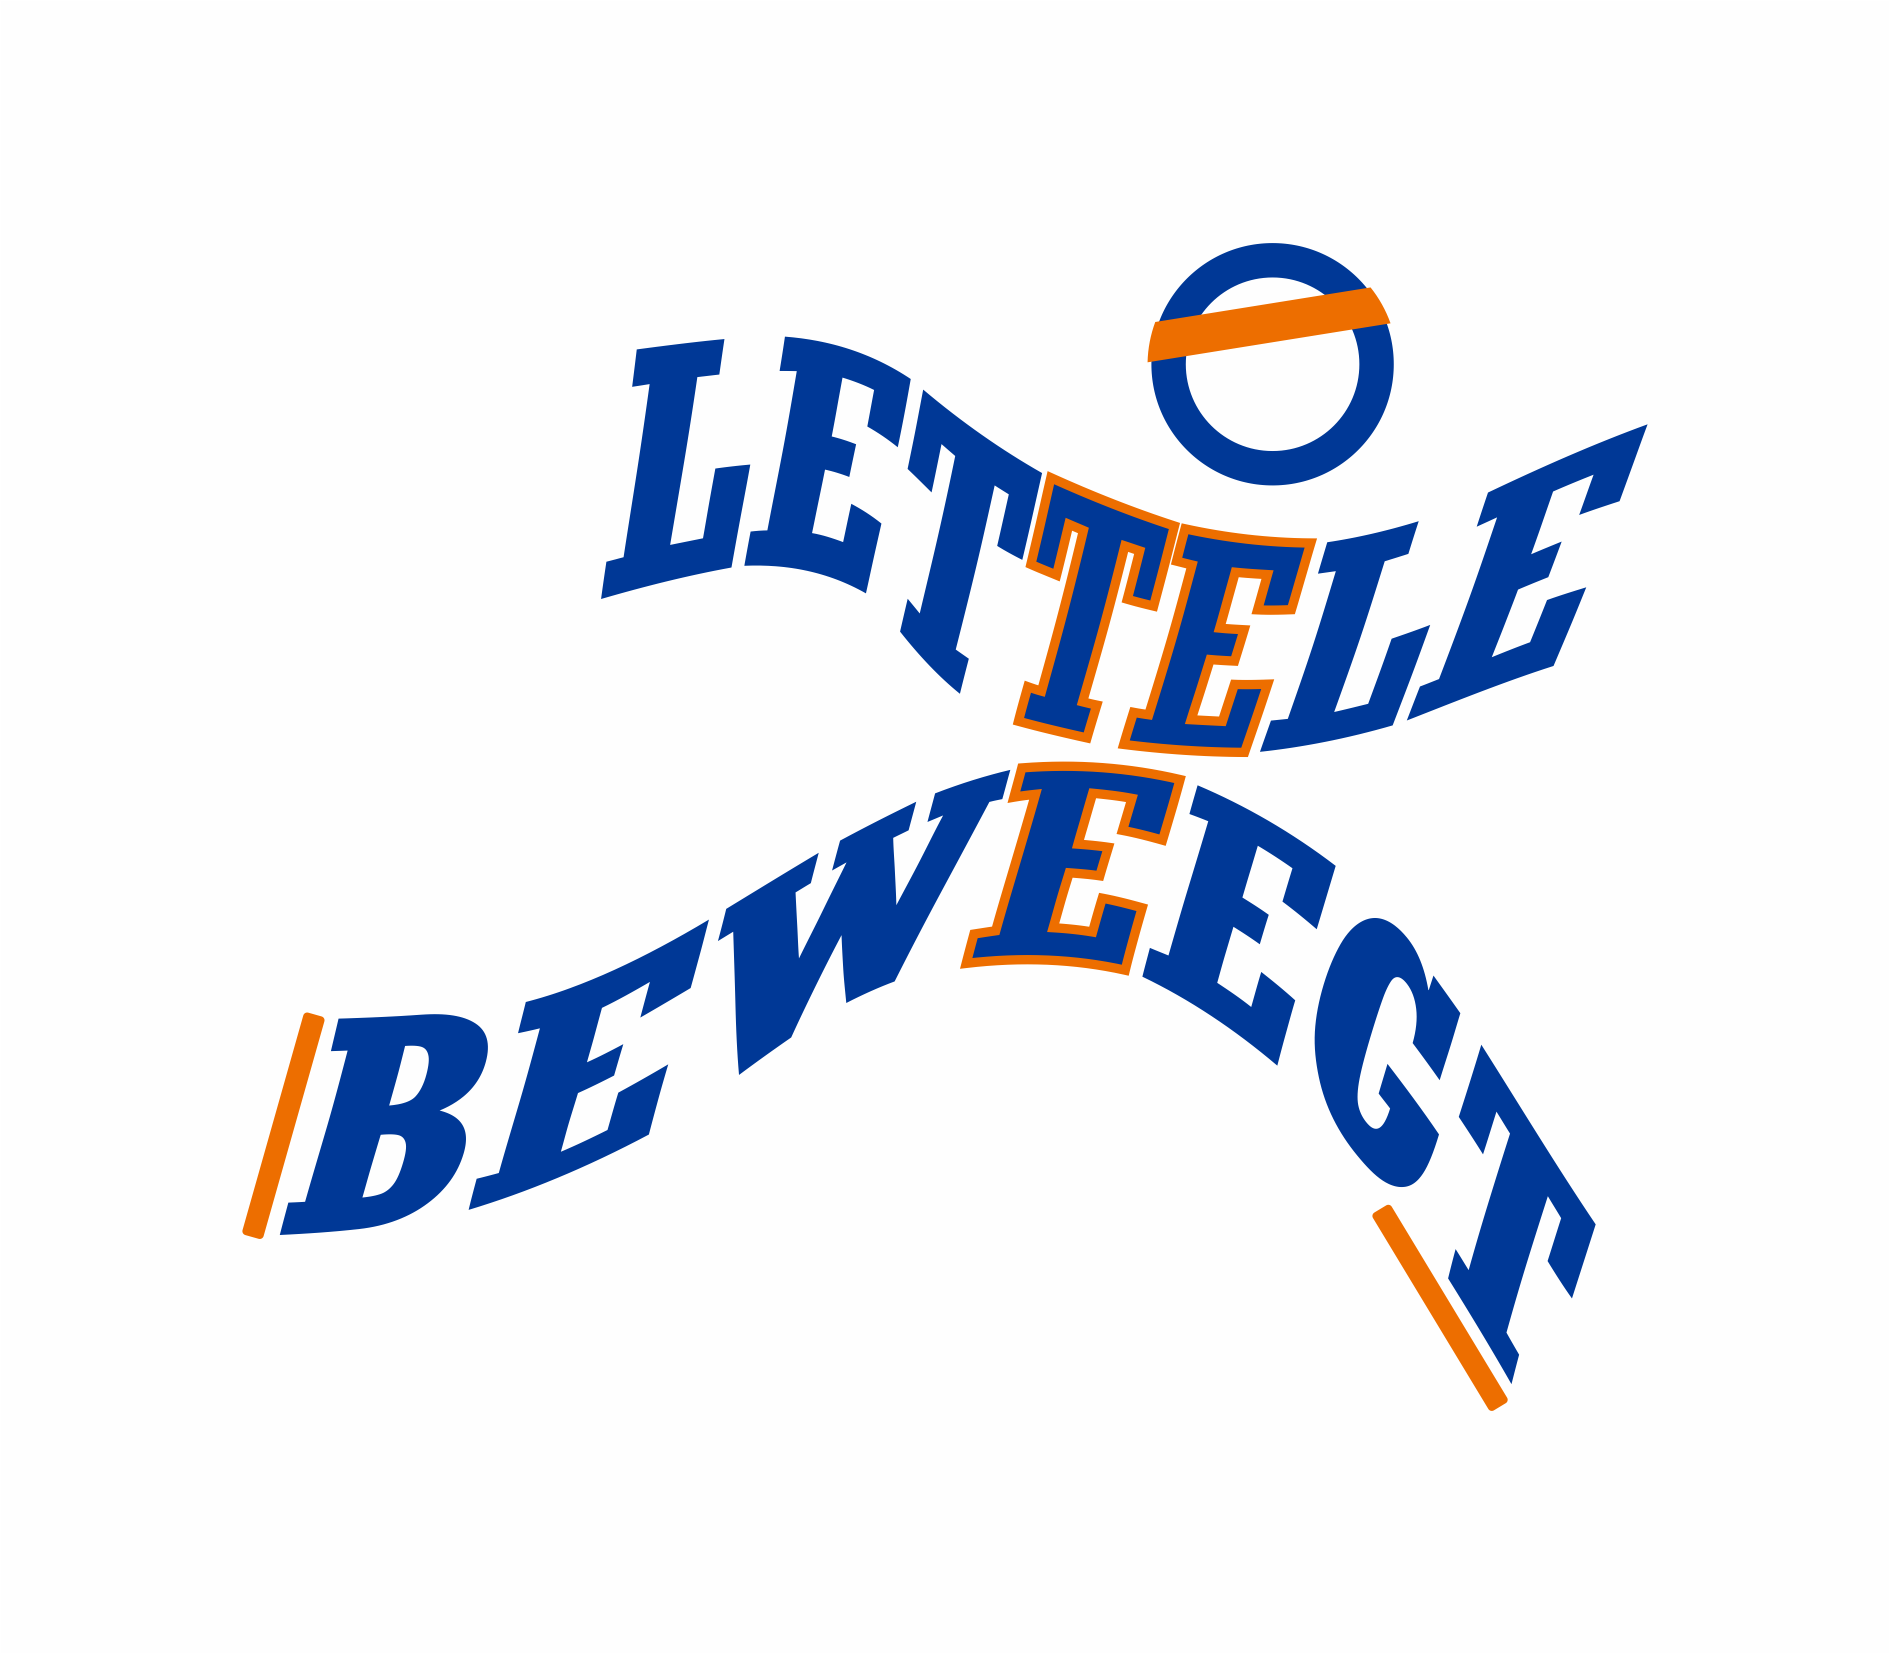 Lettele beweegt logo